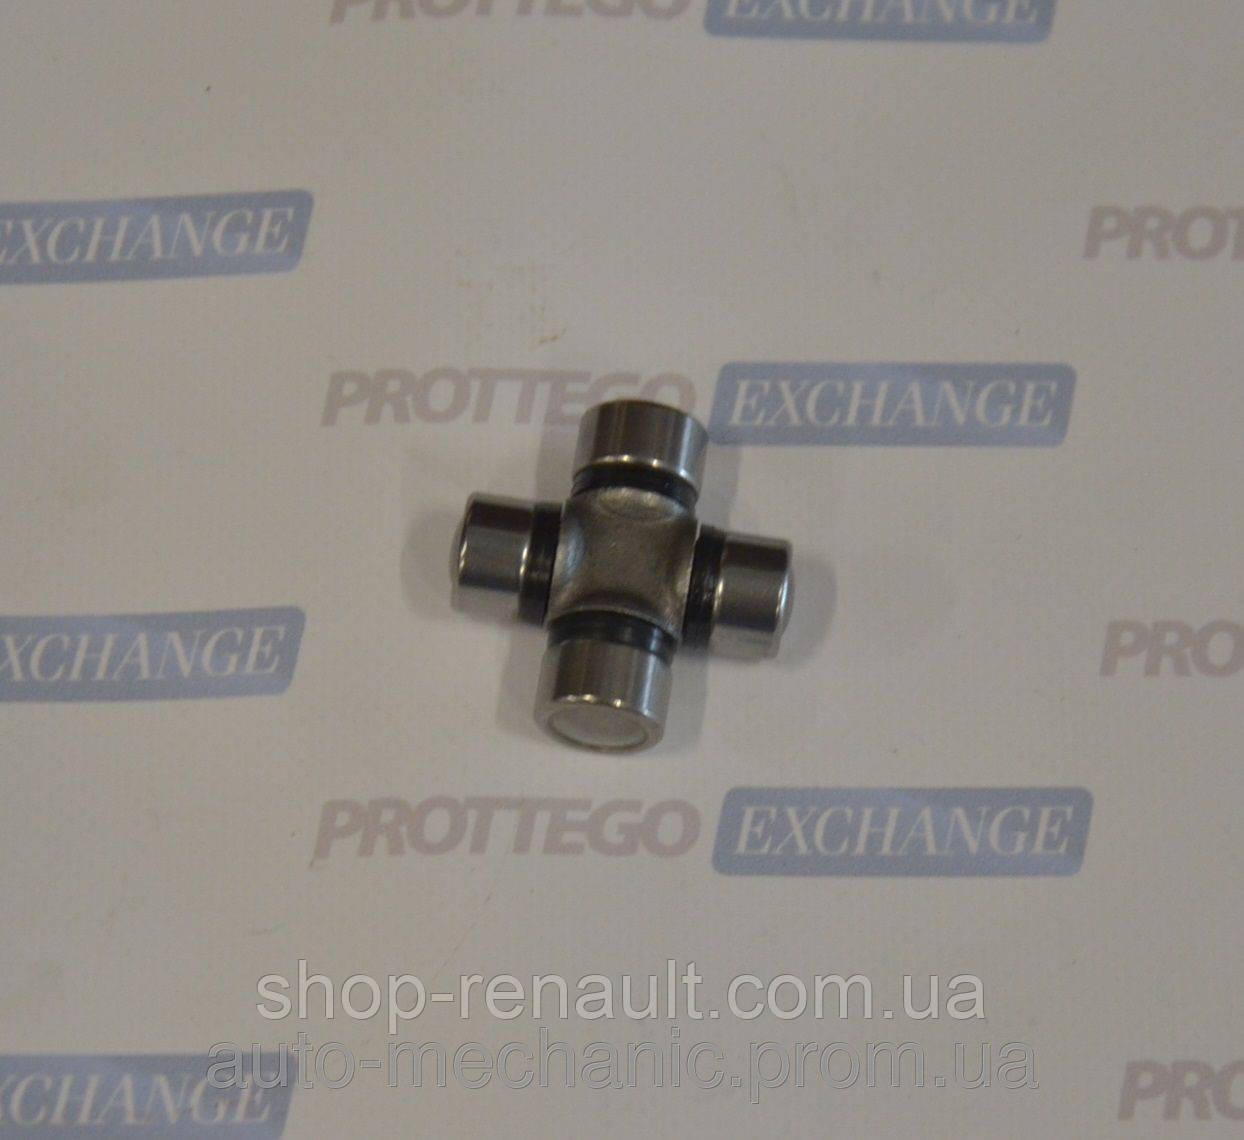 Хрестовина рульового кардана (15х16мм) Prottego Kangoo/Trafic/Opel Vivaro/Nissan Primastar 2006- >